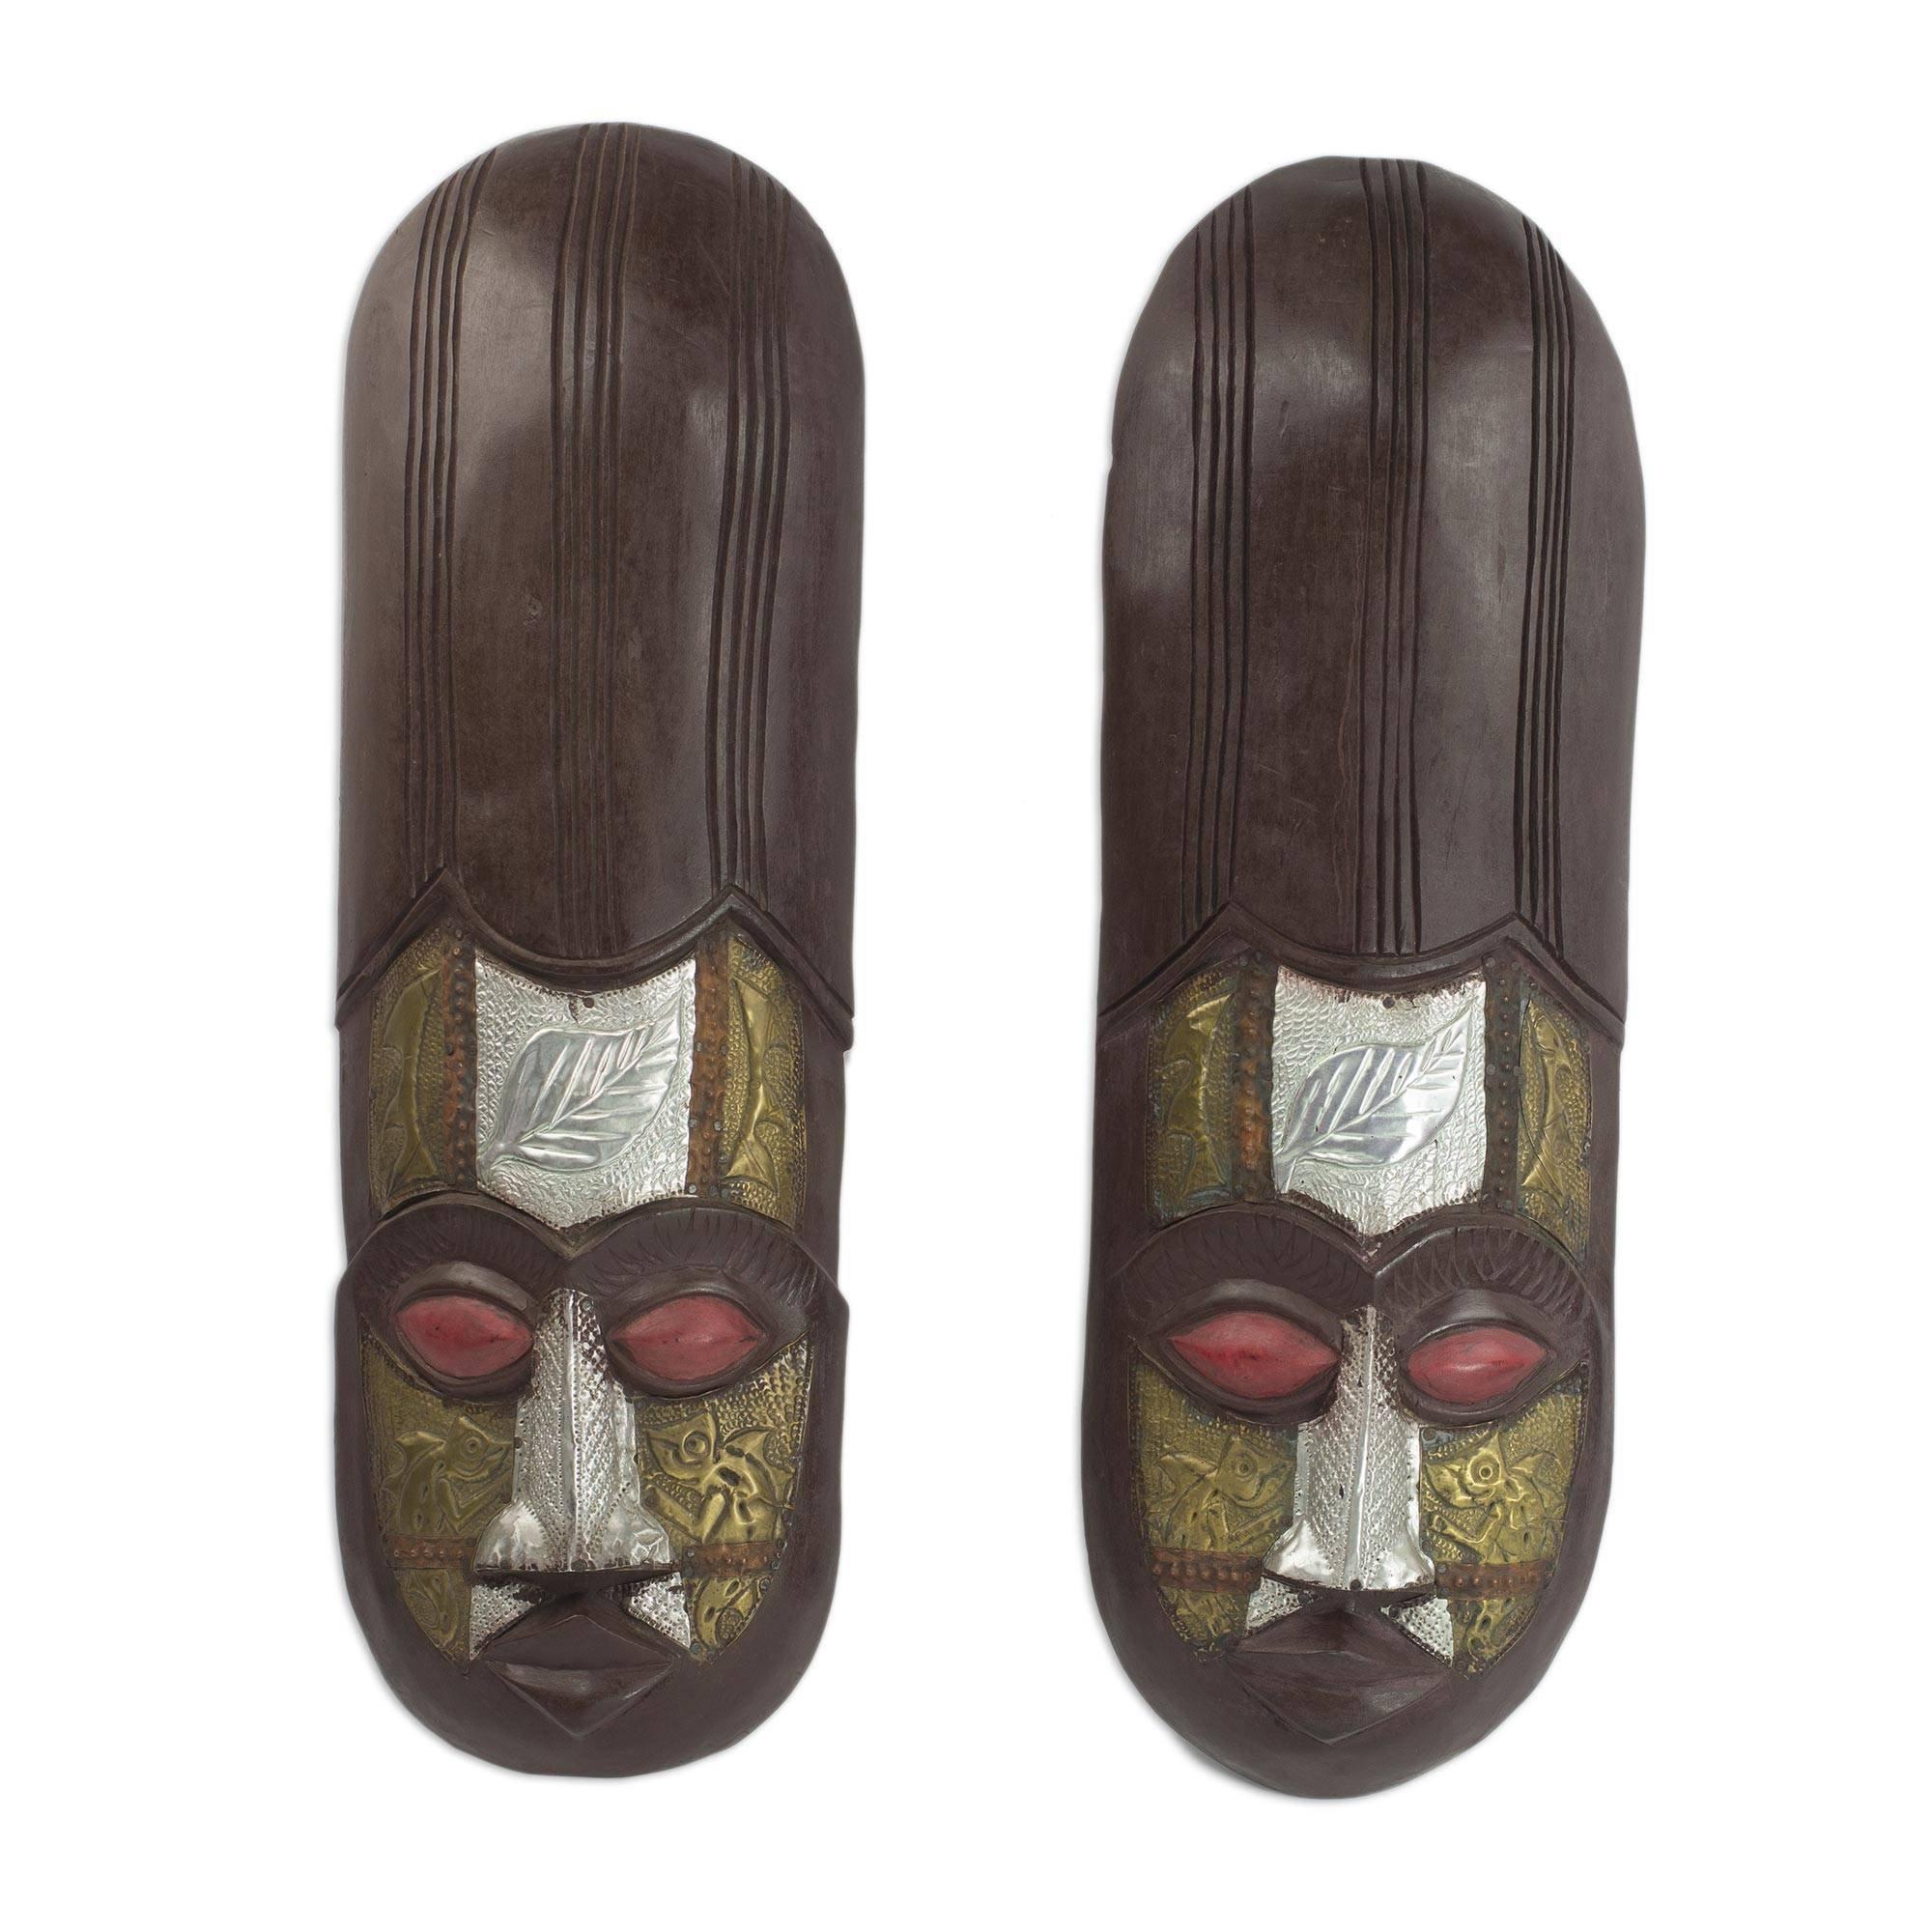 NOVICA Decorative Large Sese Wood Mask, Brown 'Baoule Asafo'